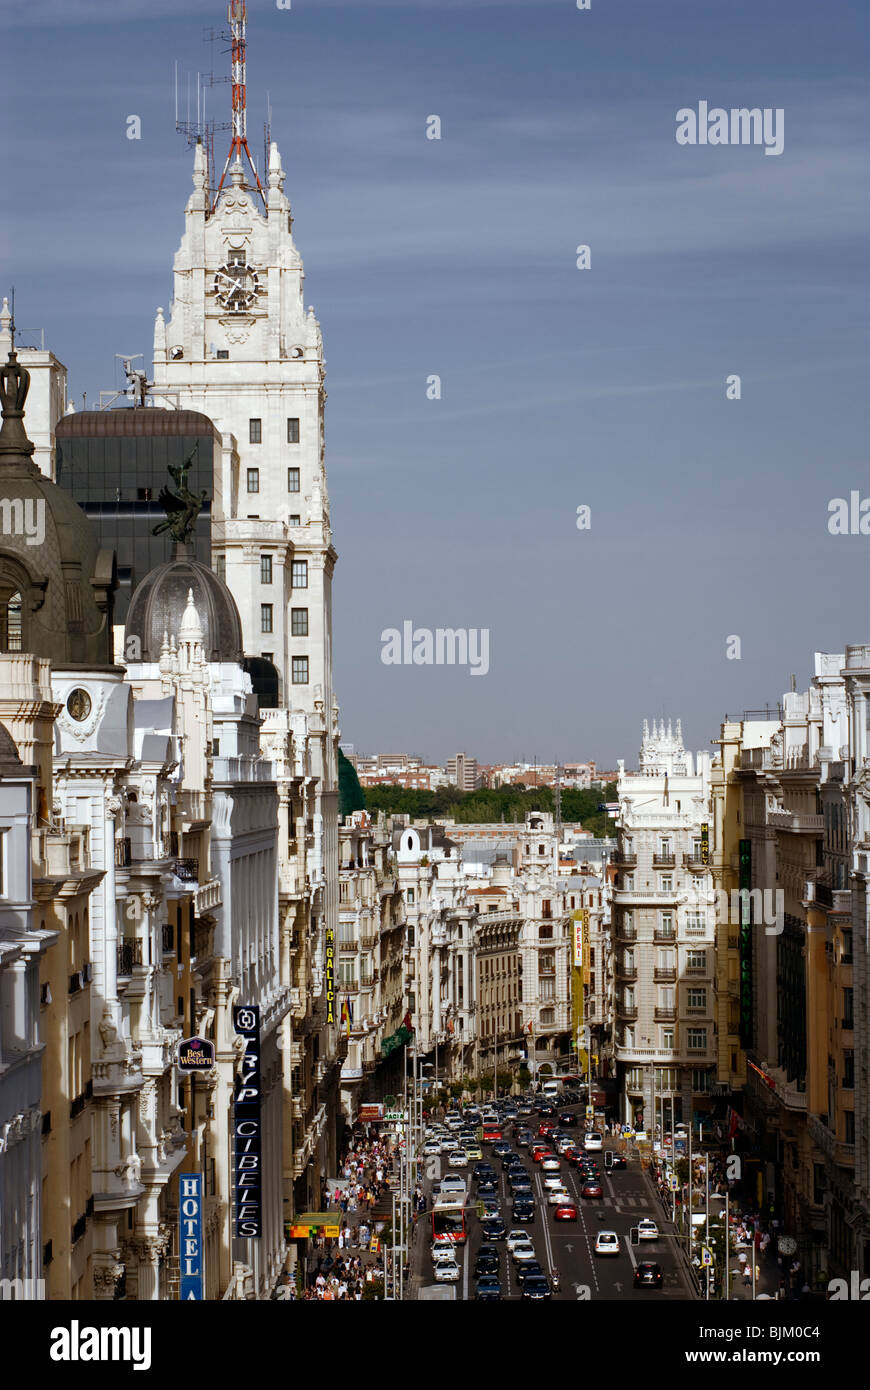 Telefonica building and Gran Via, Madrid, Spain, Europe Stock Photo